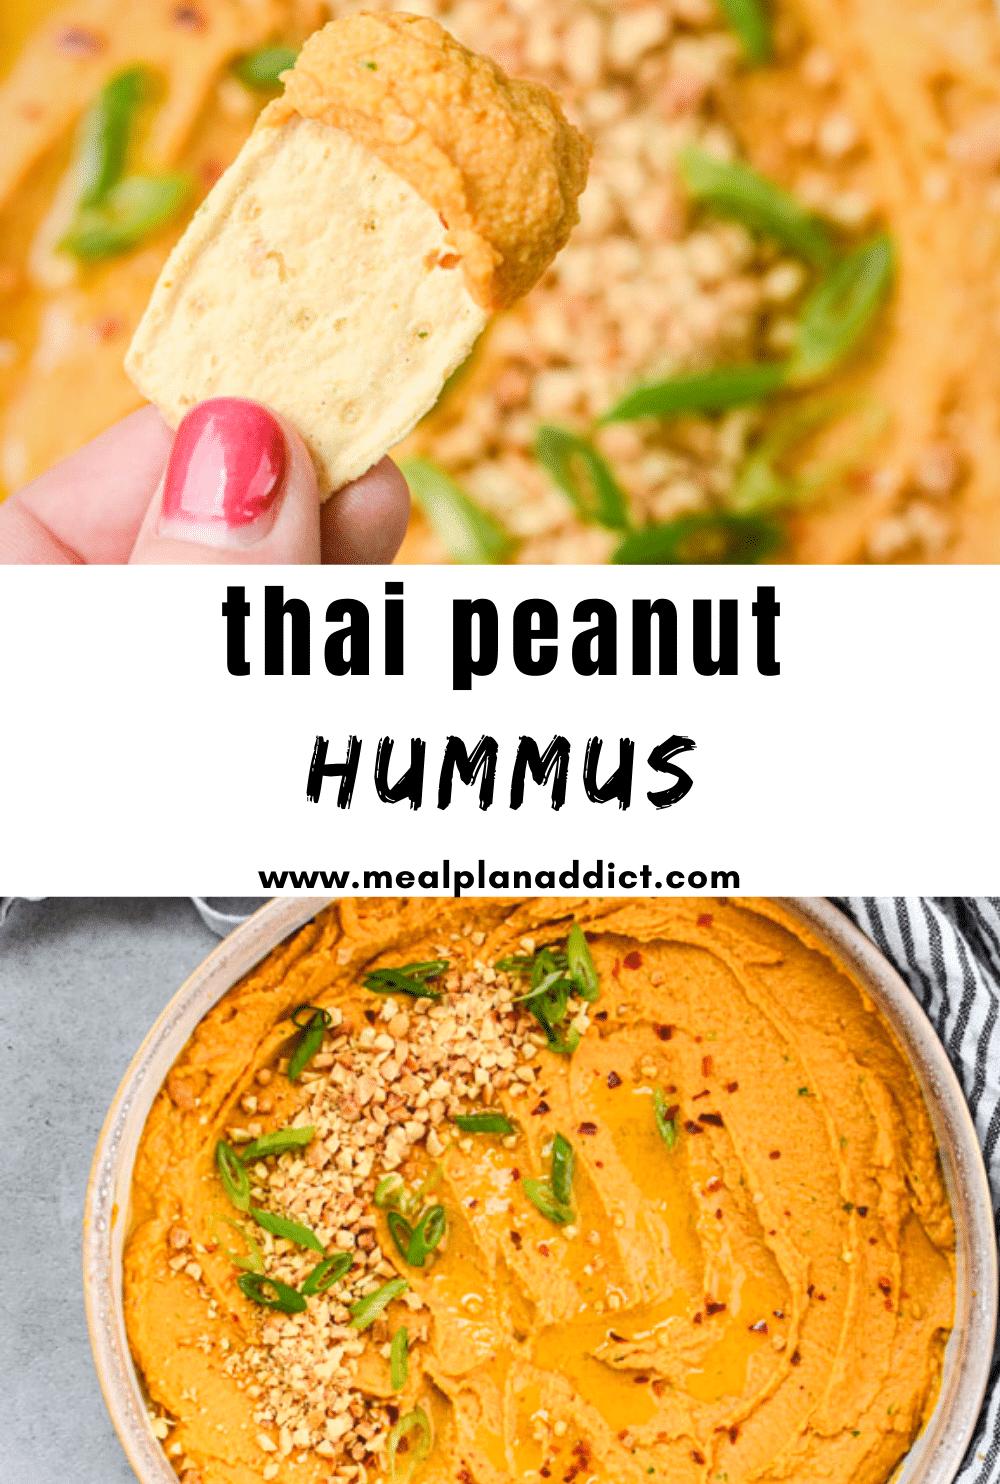 thai peanut hummus pin with 2 images